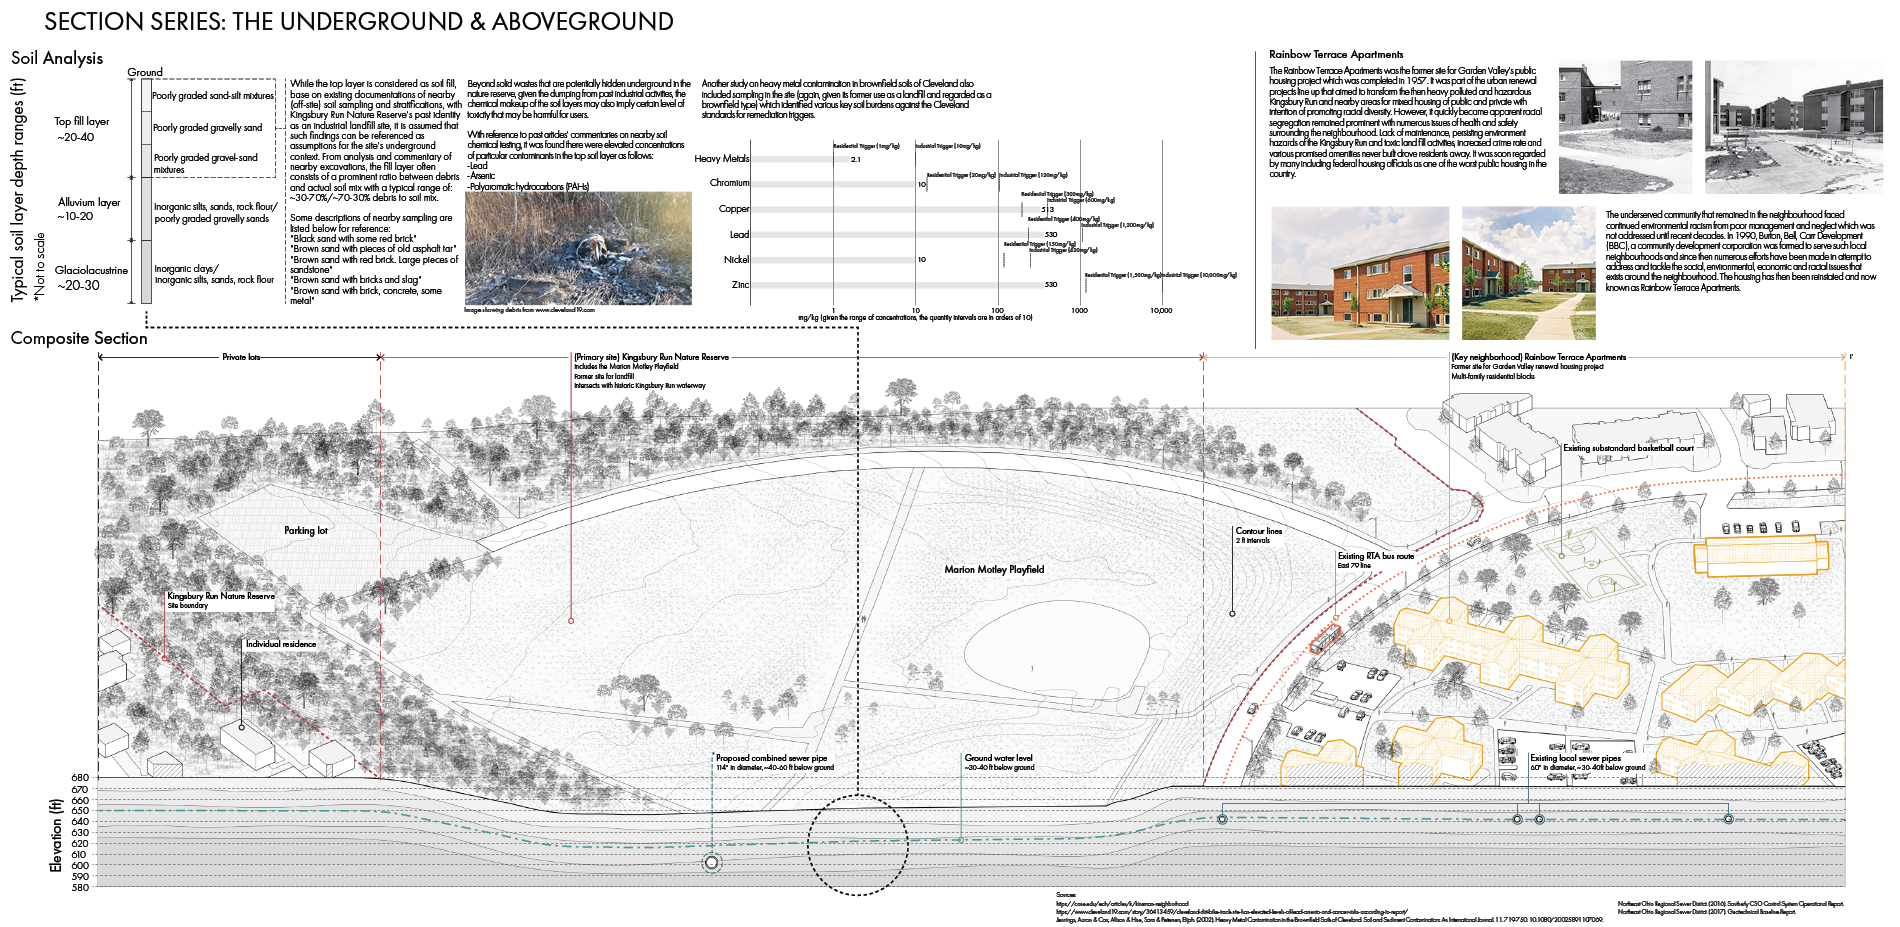 Section Series 1: The Underground & Aboveground